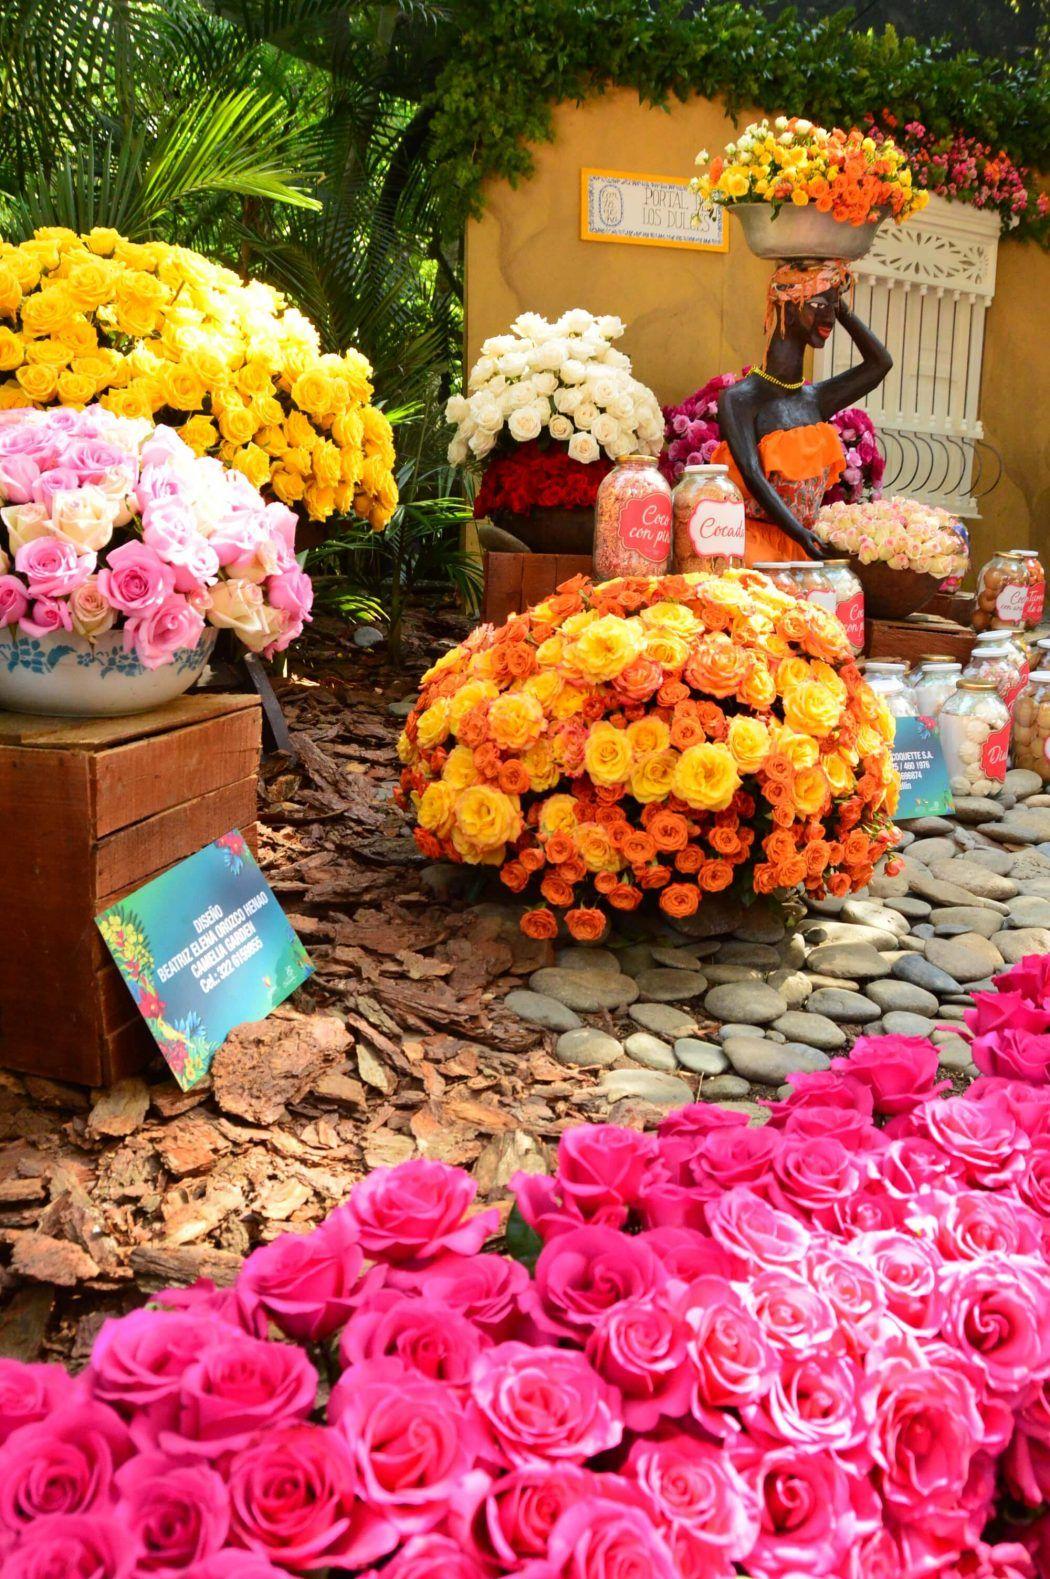 Festival de las flores display of orange and pink flowers